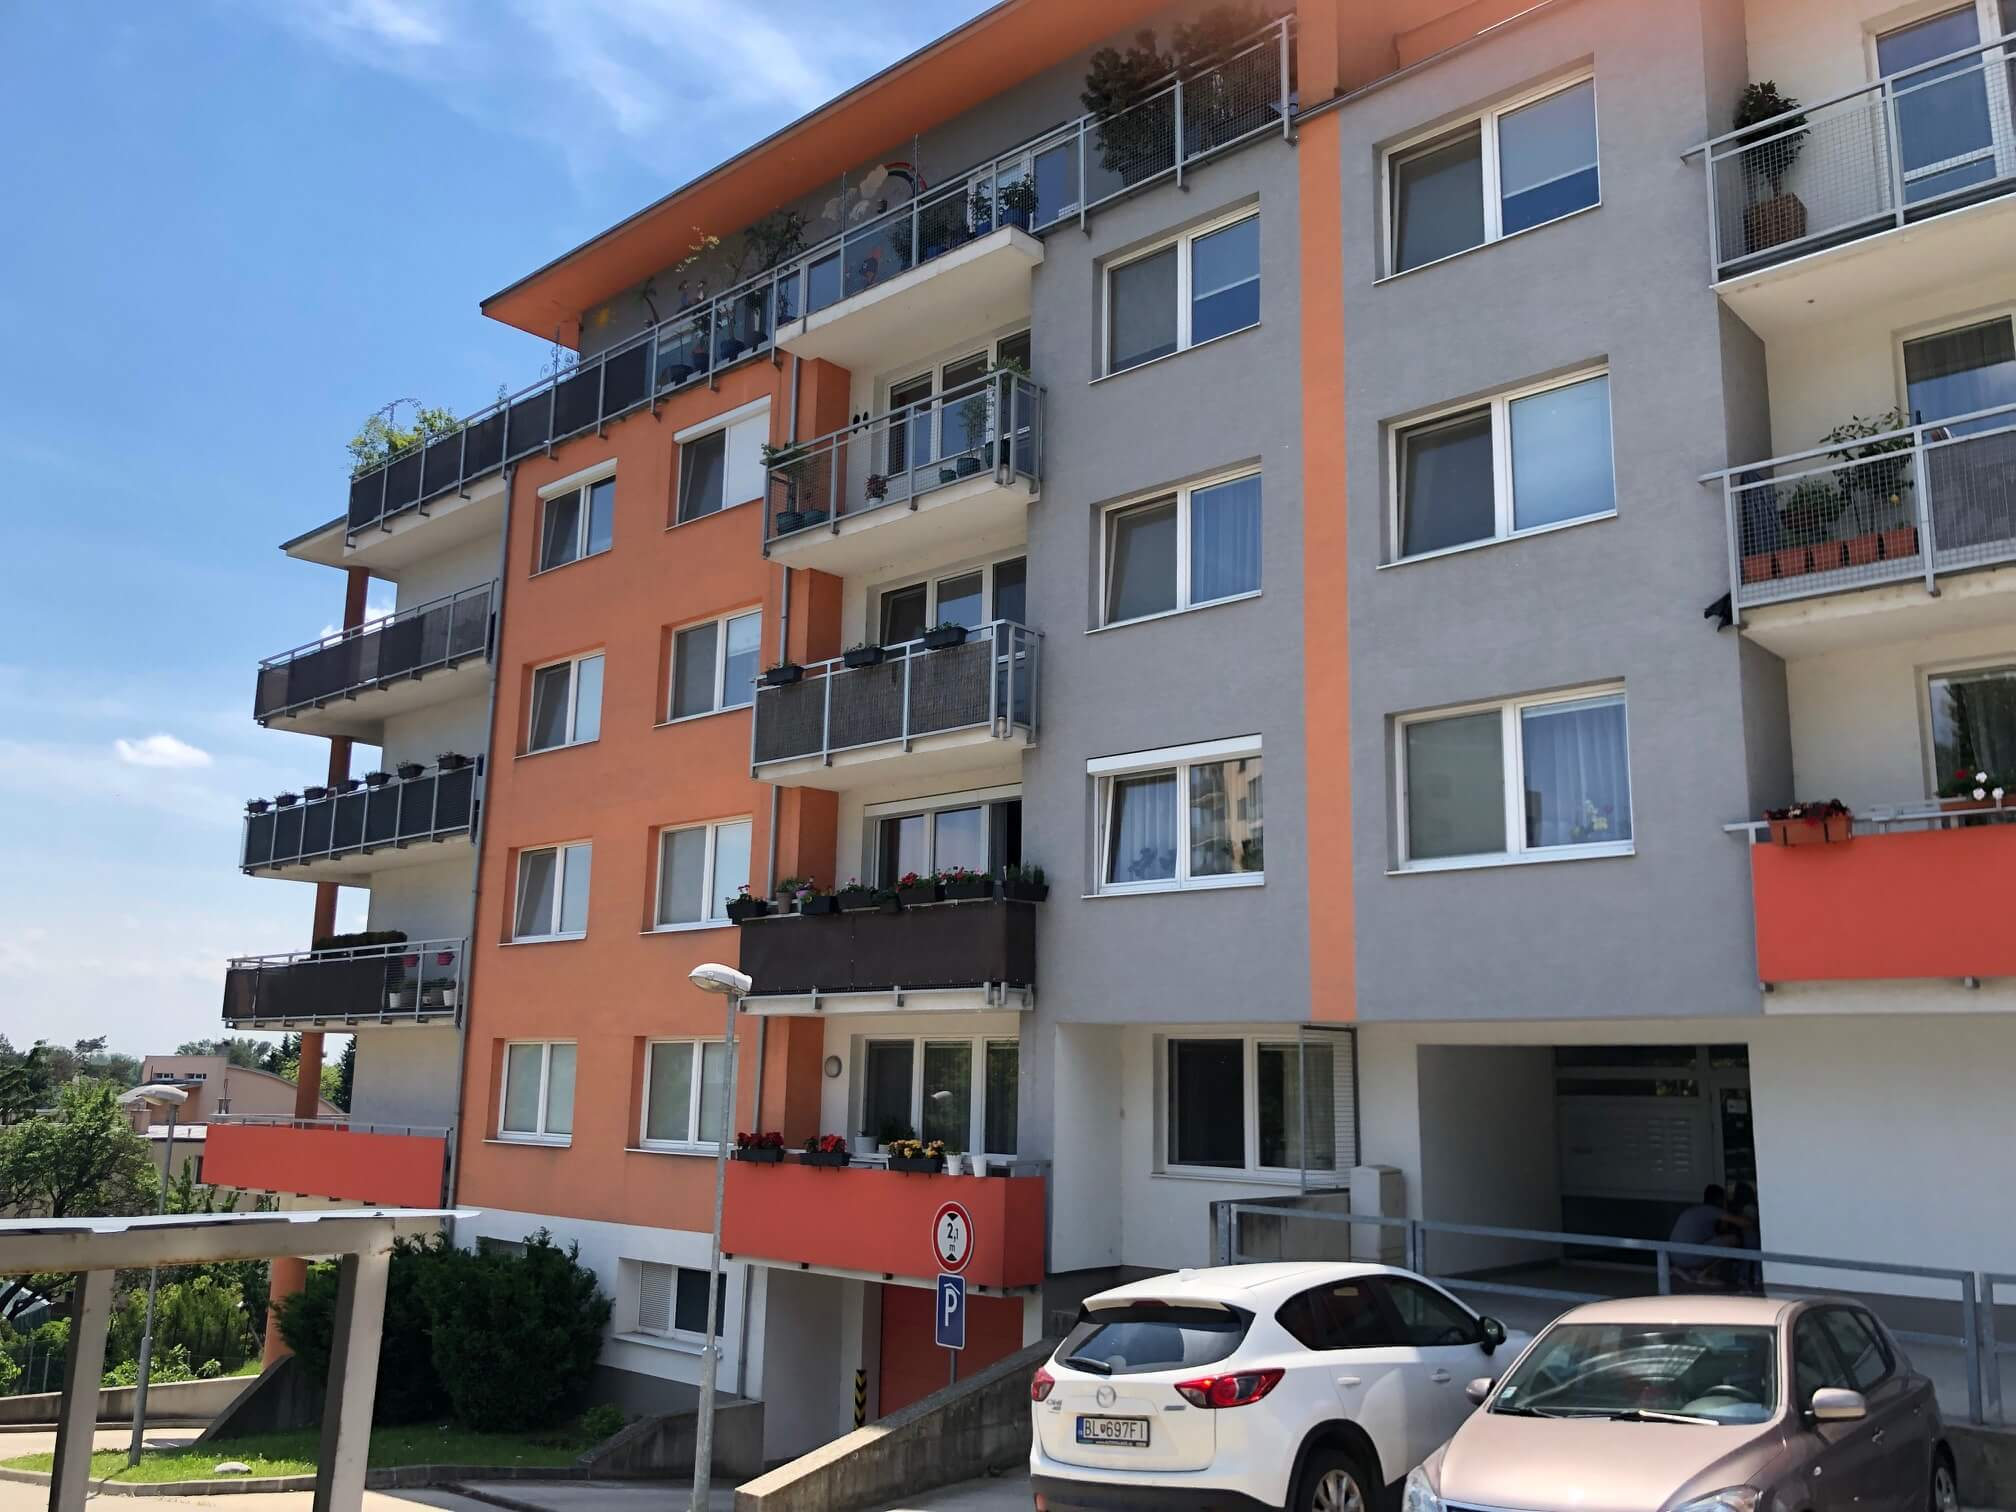 Rezervované: 3 izbový byt, novostavba, 72,25m2, loggia 4,82m2, Staré Grunty, Karlovka, garážové státie-2